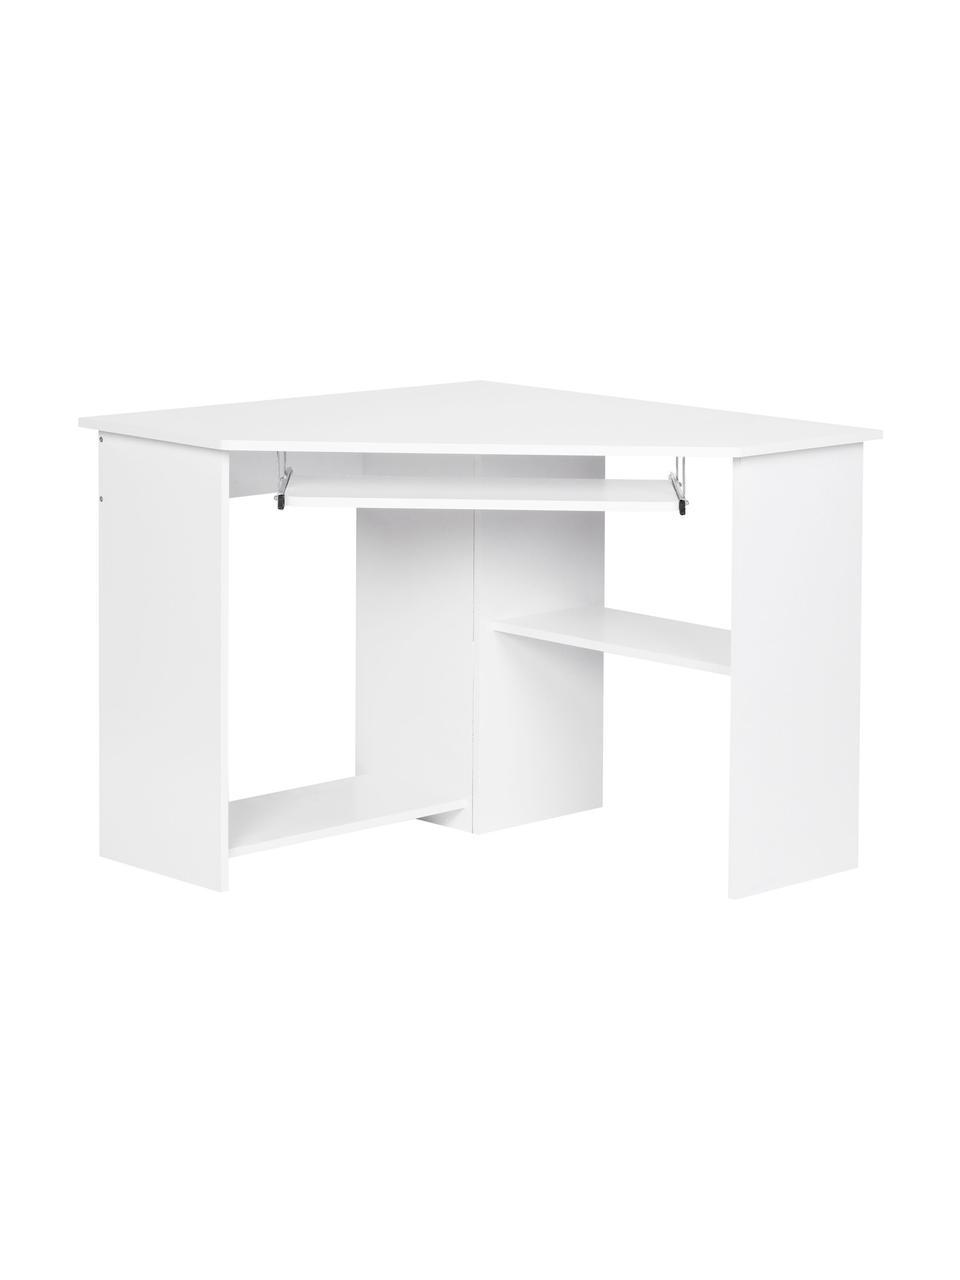 Wit hoekbureau Roman met toetsenbordverlenging, Gelakt MDF Metalen rails, Mat wit, B 127 x D 89 cm